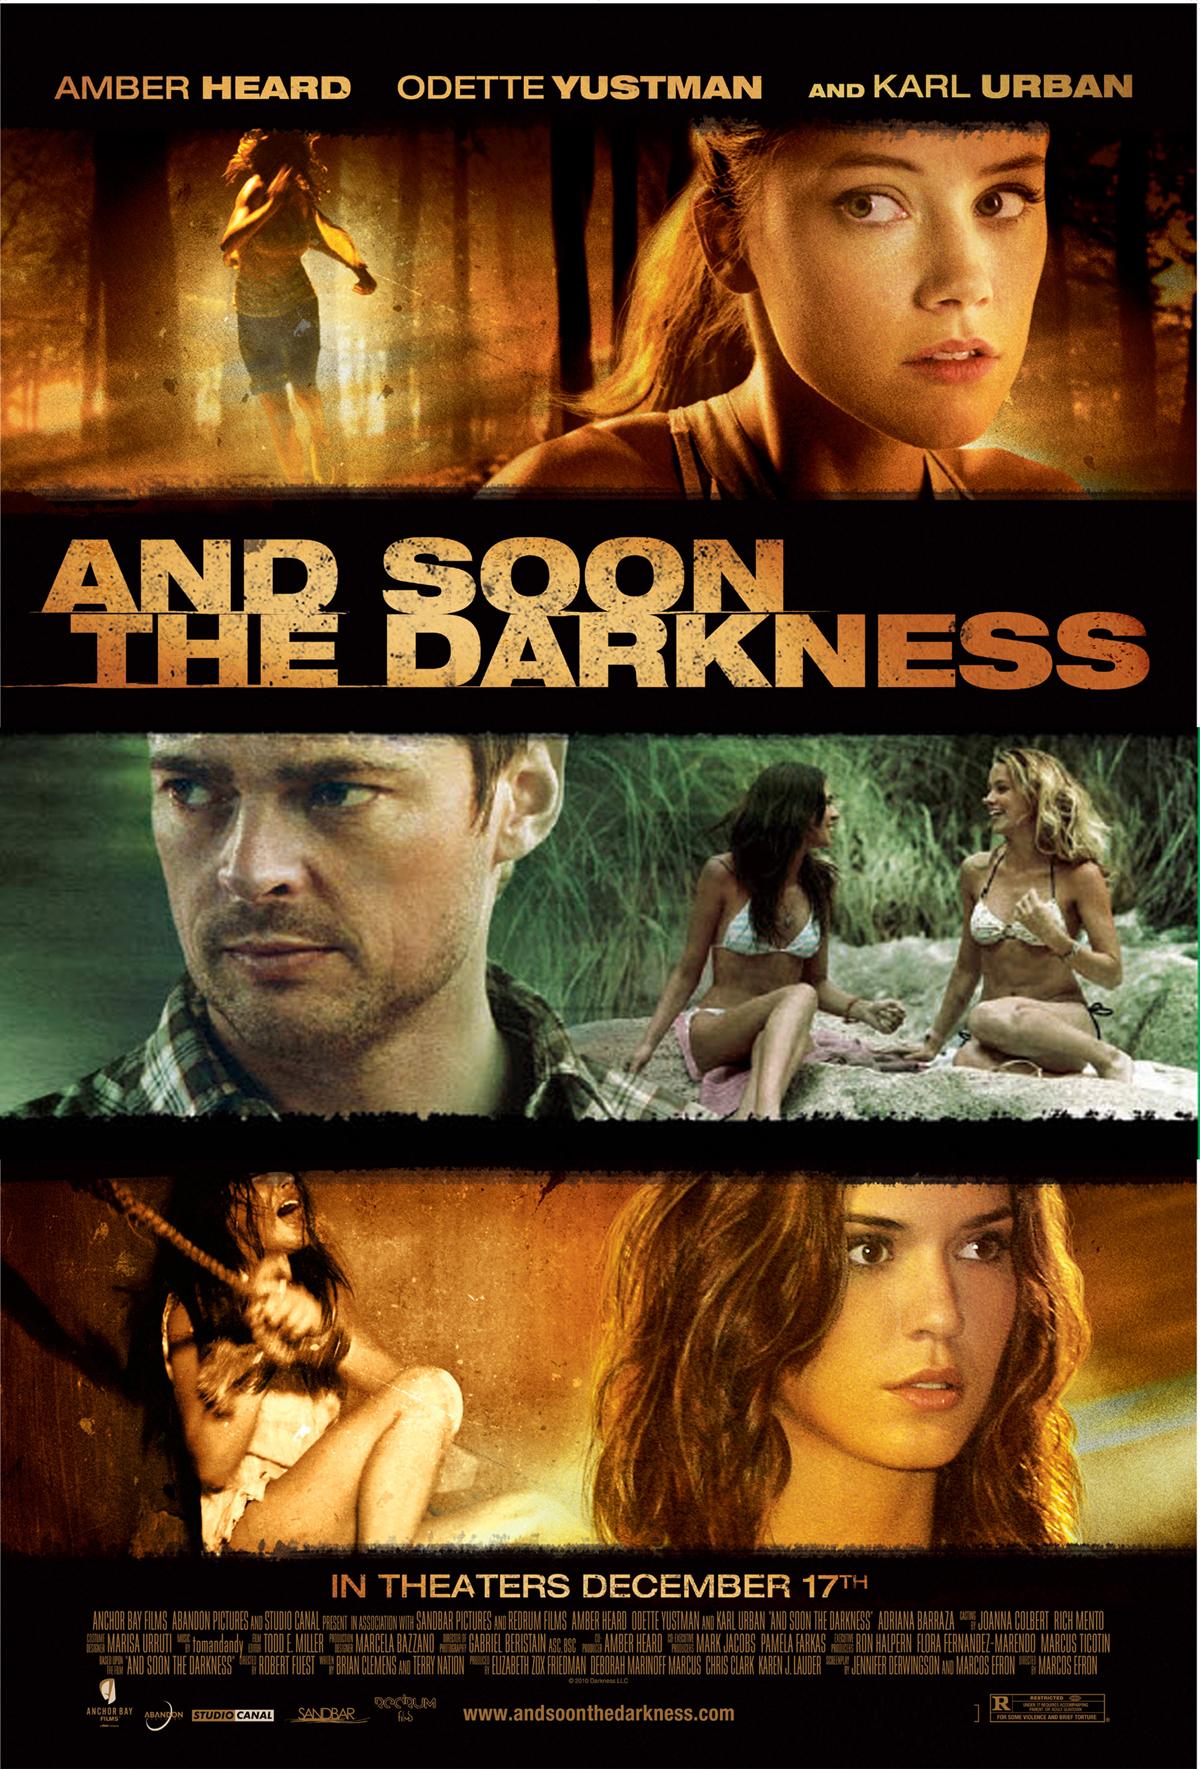 http://1.bp.blogspot.com/_H5ZaOhZvc3Y/TRJImVHOcVI/AAAAAAAAHmw/ACnDxowgFk4/s0/And+Soon+the+Darkness+-+0.jpg